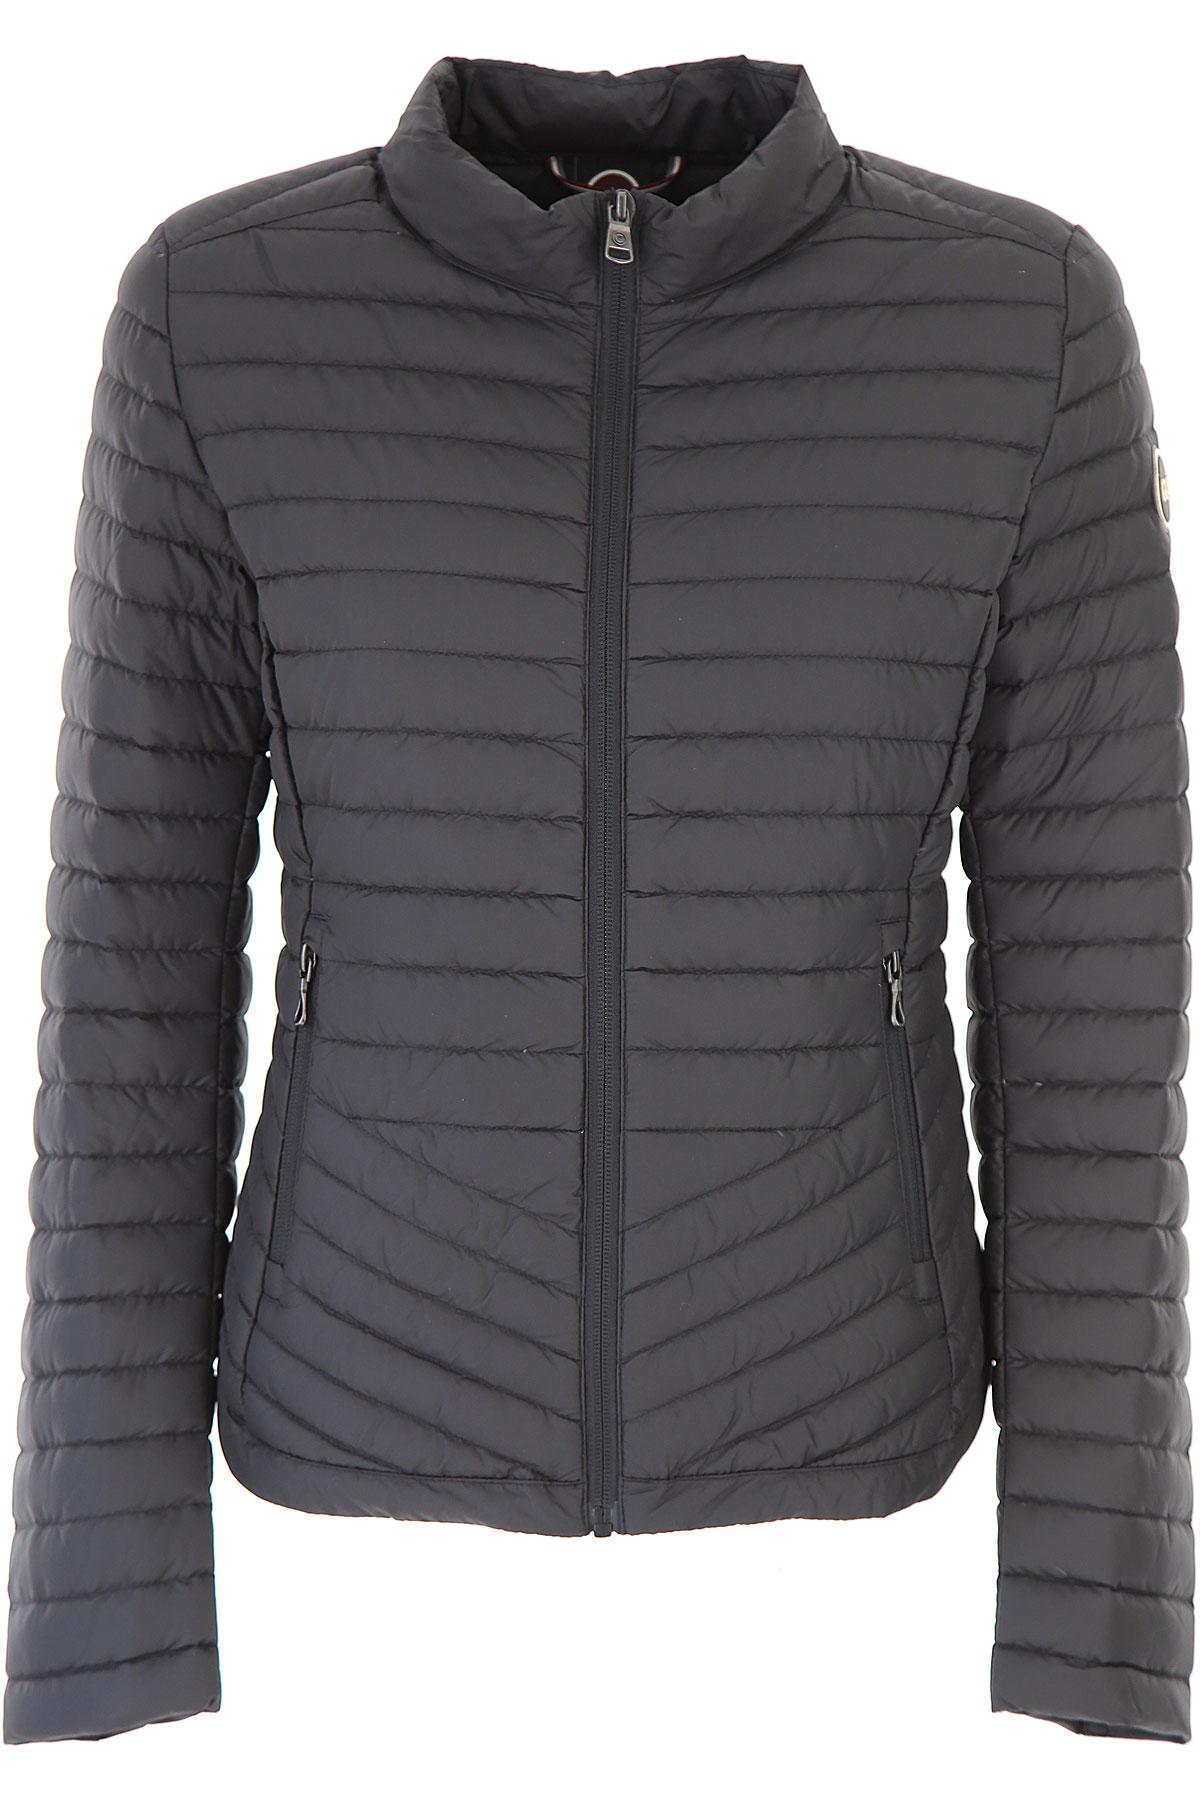 Blauer Down Jacket for Women, Puffer Ski Jacket On Sale, Black, polyamide, 2019, 10 12 2 4 6 8